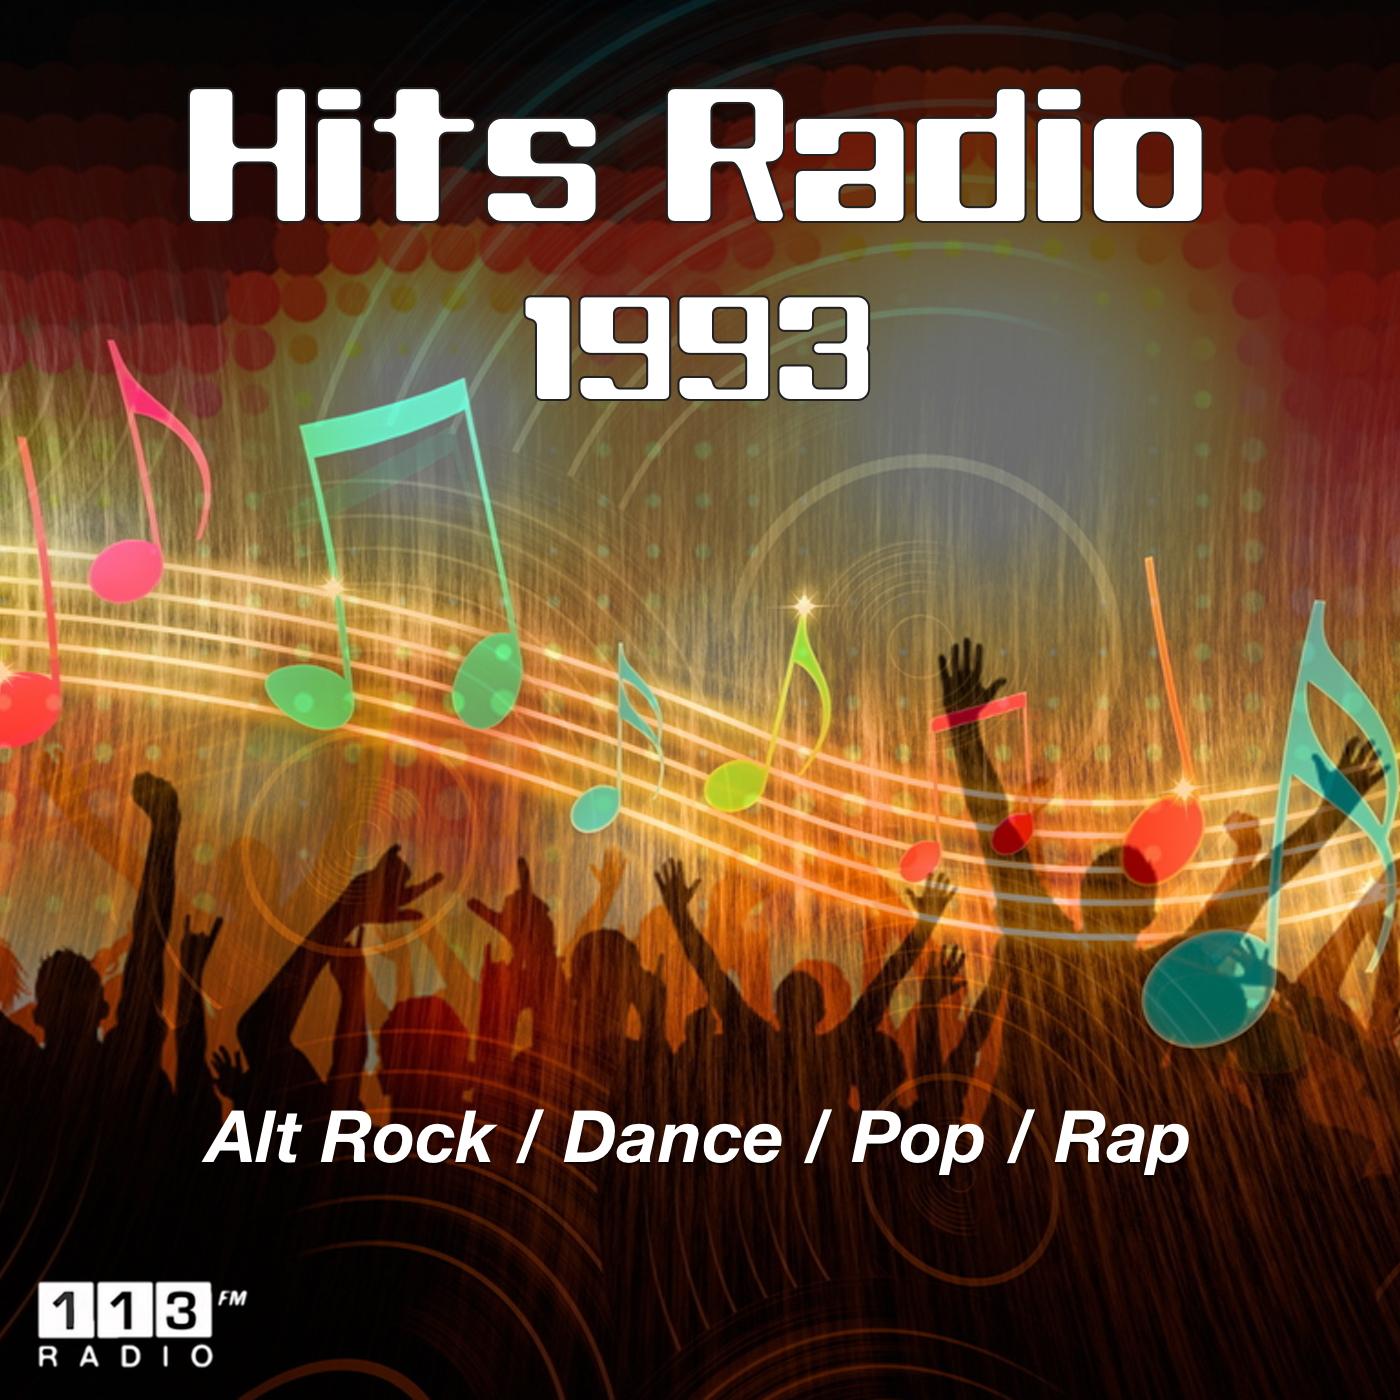 113.fm Hits Radio - 1993